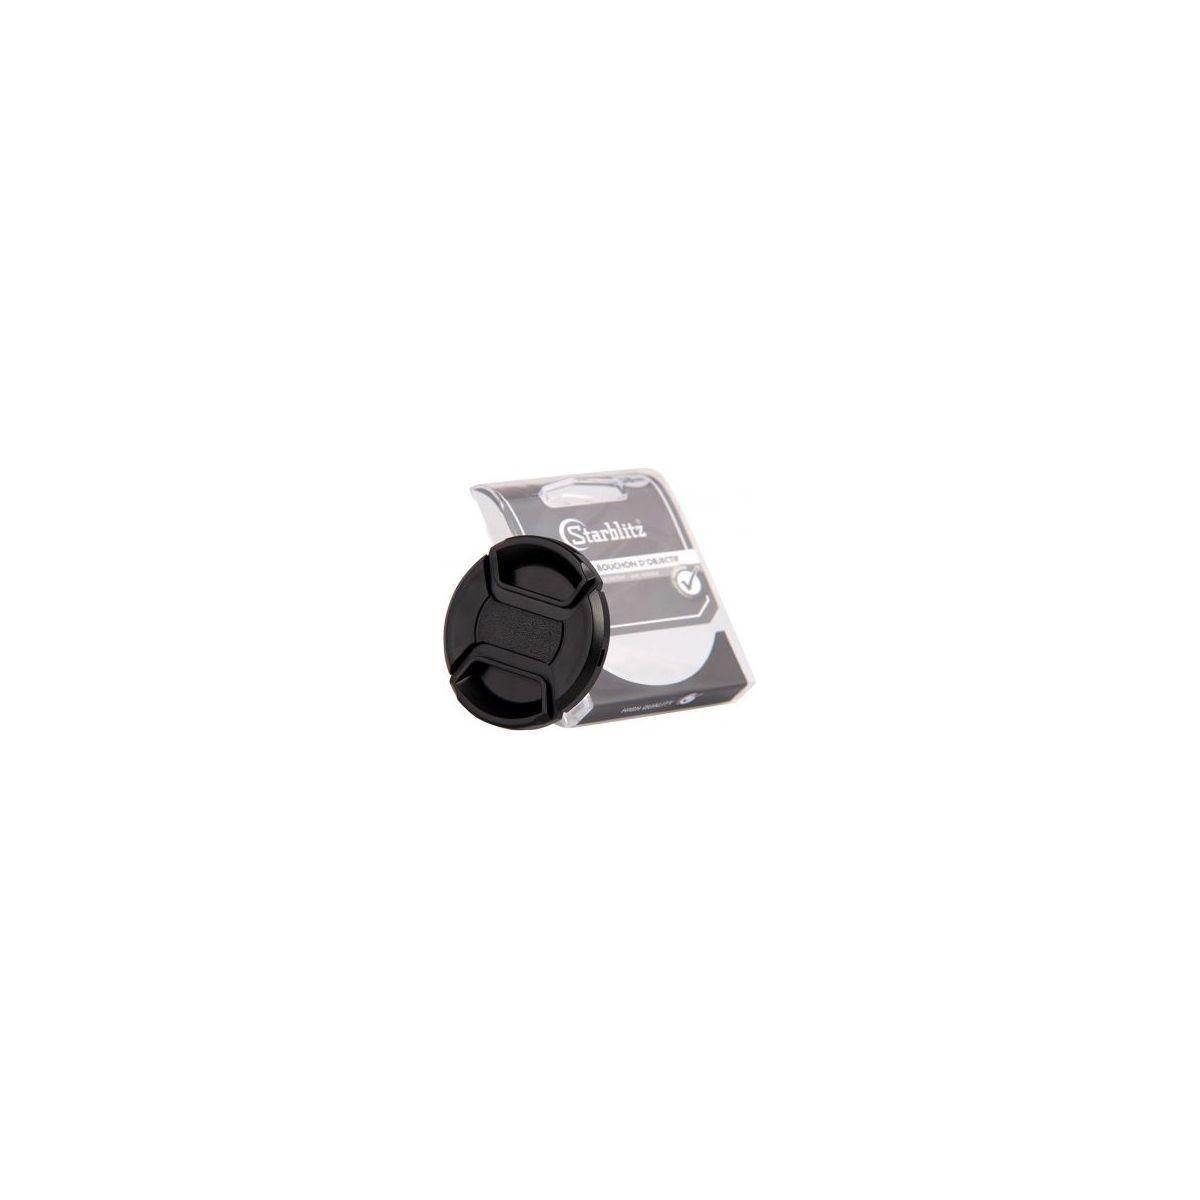 Bouchon d'objectif starblitz d'objectif 62mm (photo)